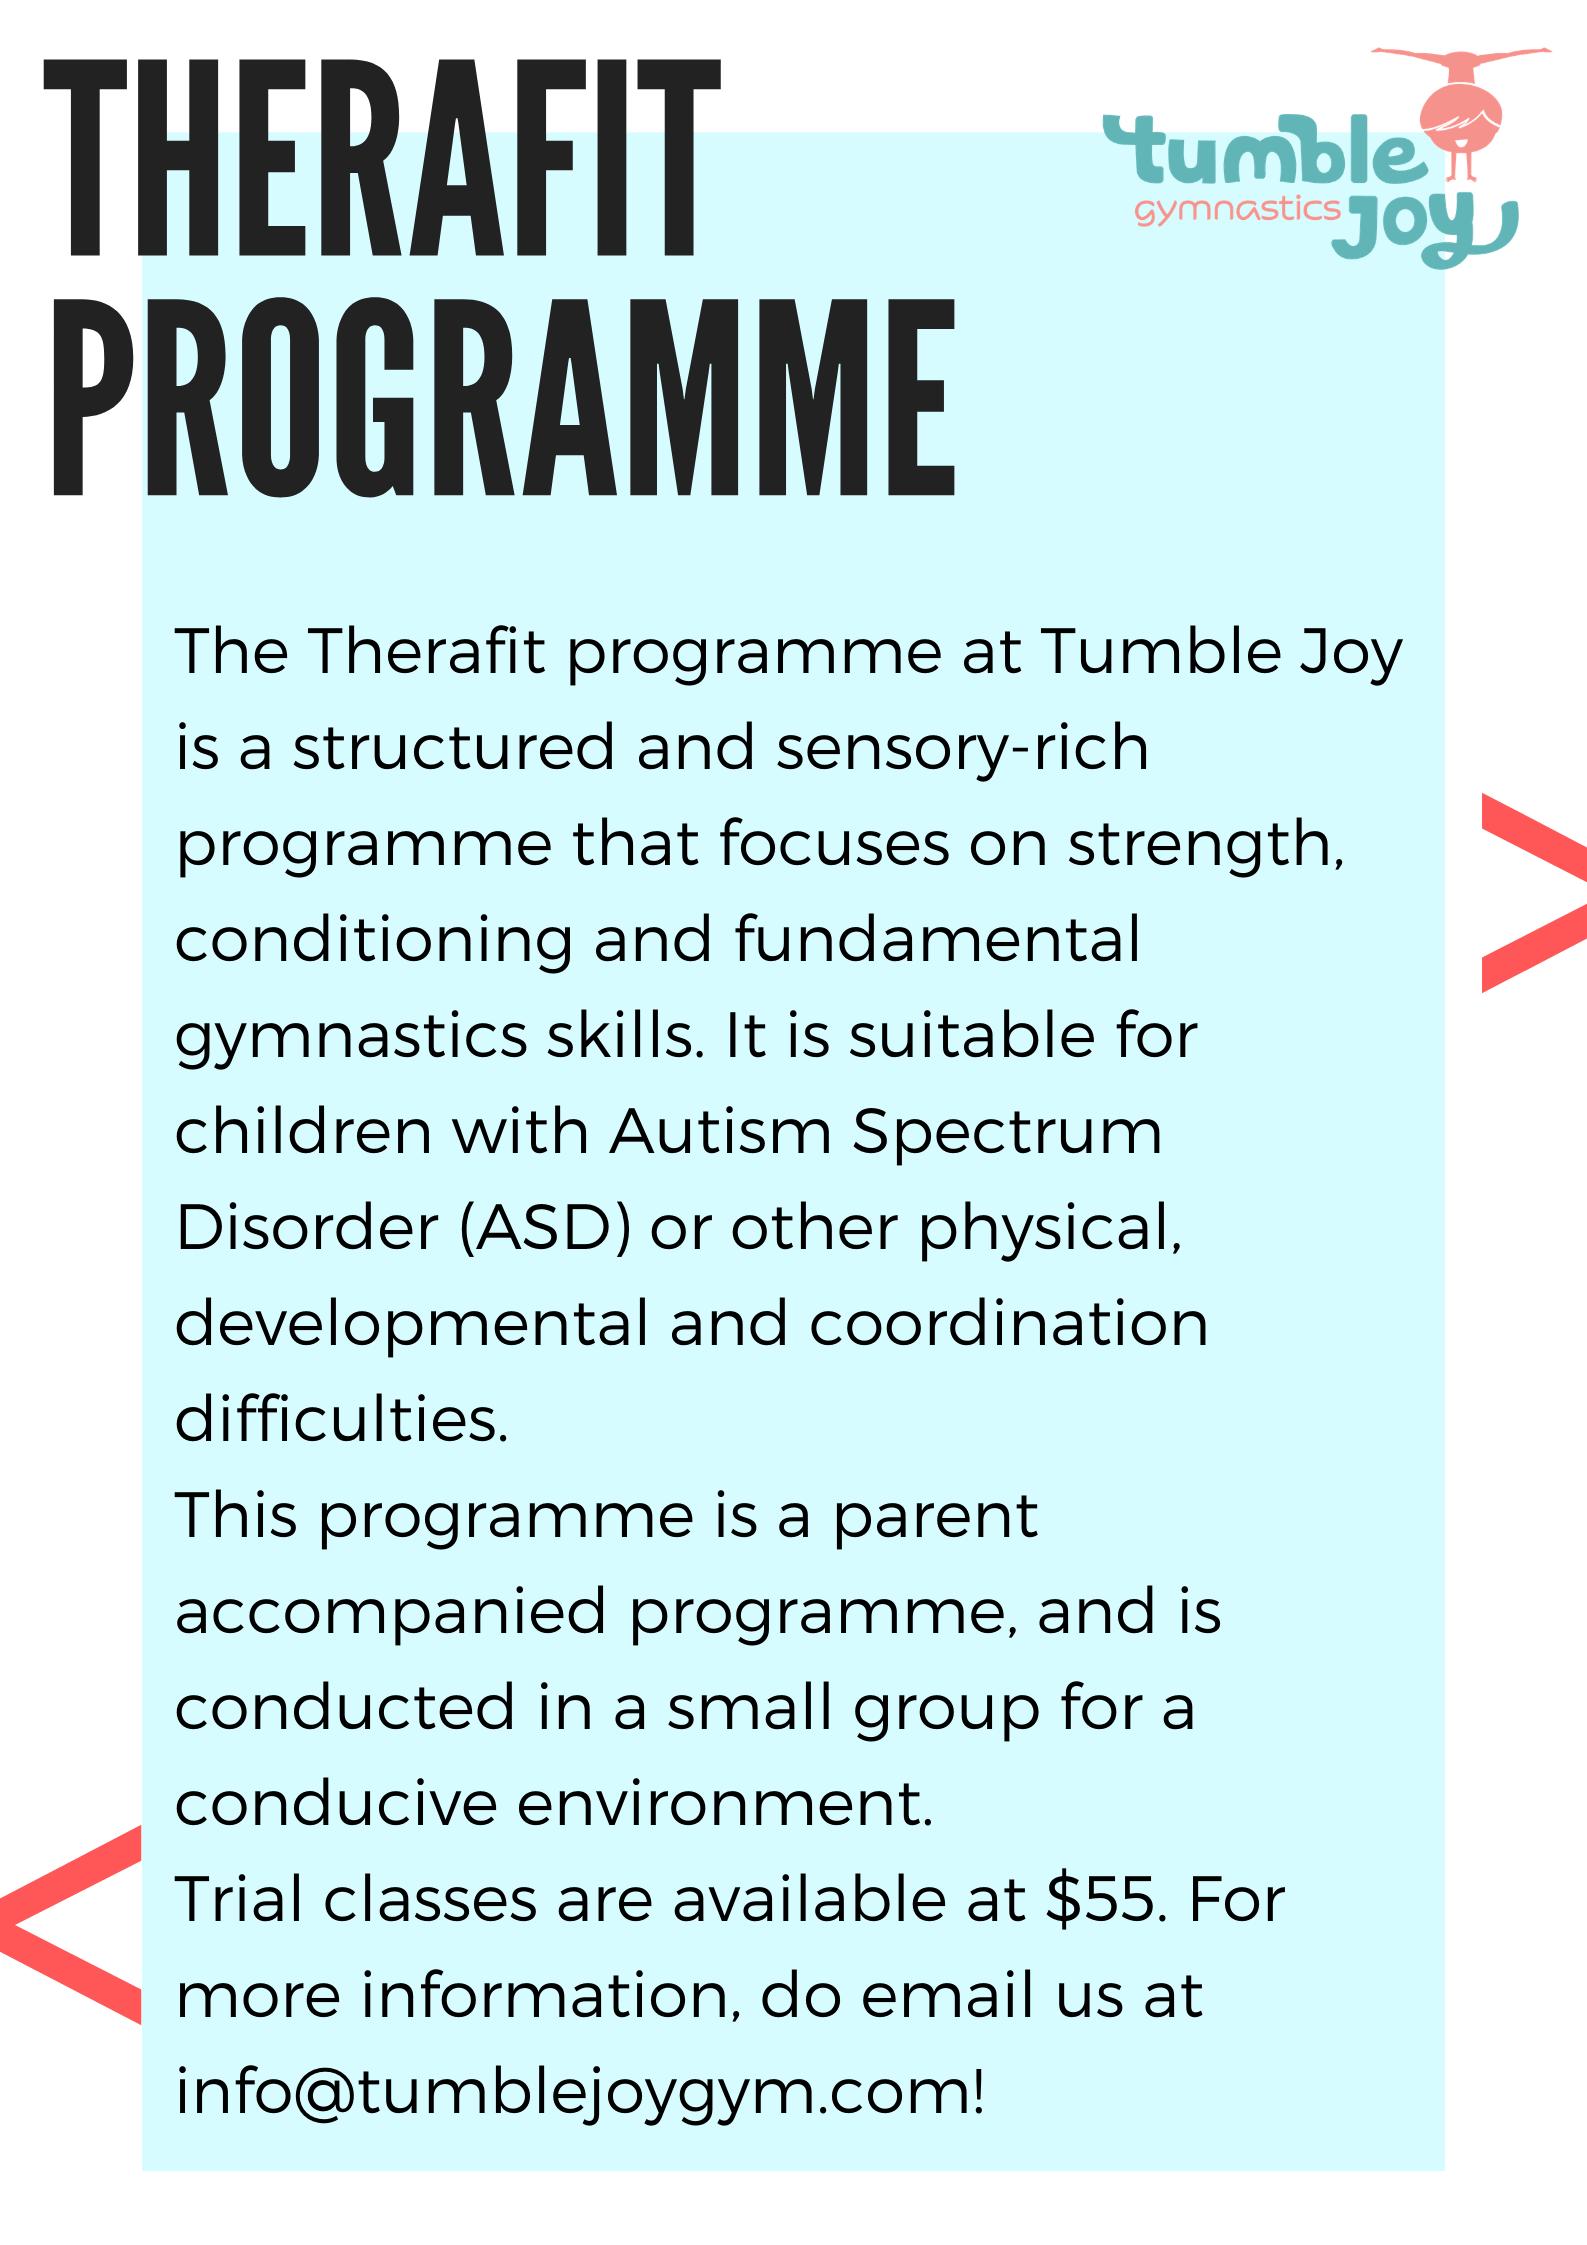 Therafit Program!